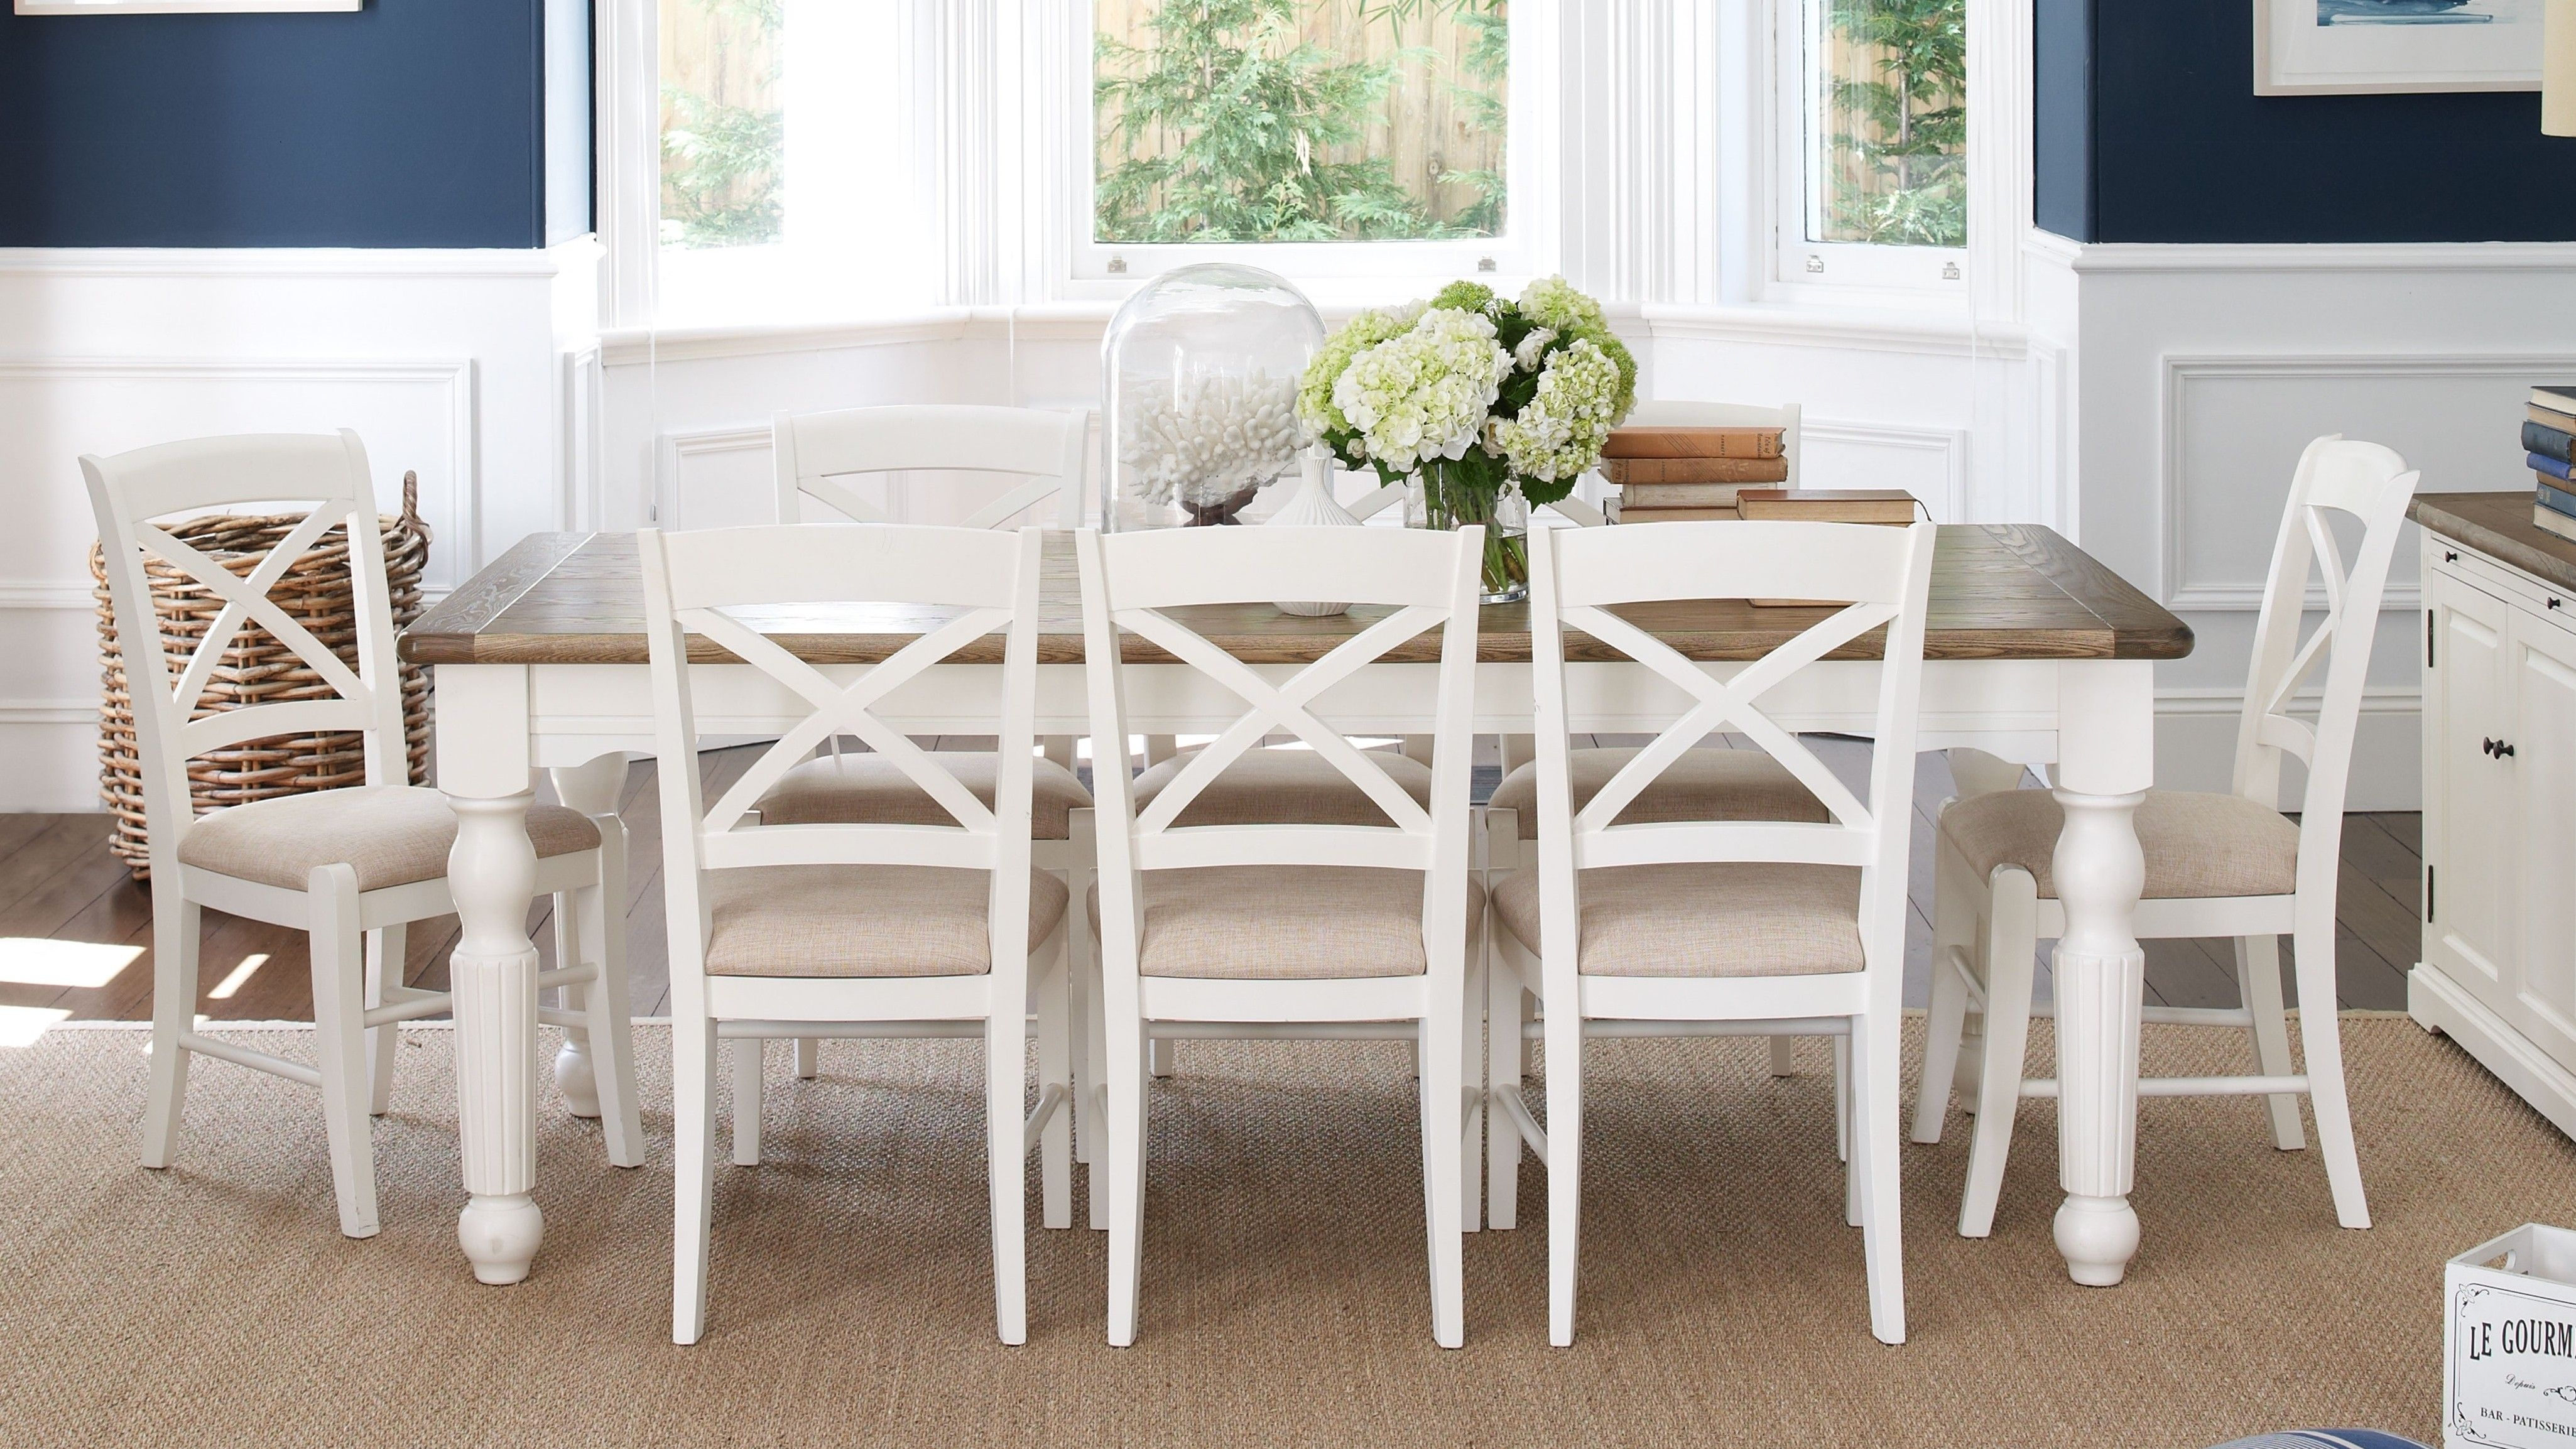 Swing Chair Harvey Norman Antique Wooden Folding Chairs Bordeaux 9 Piece Dining Suite Room Pinterest